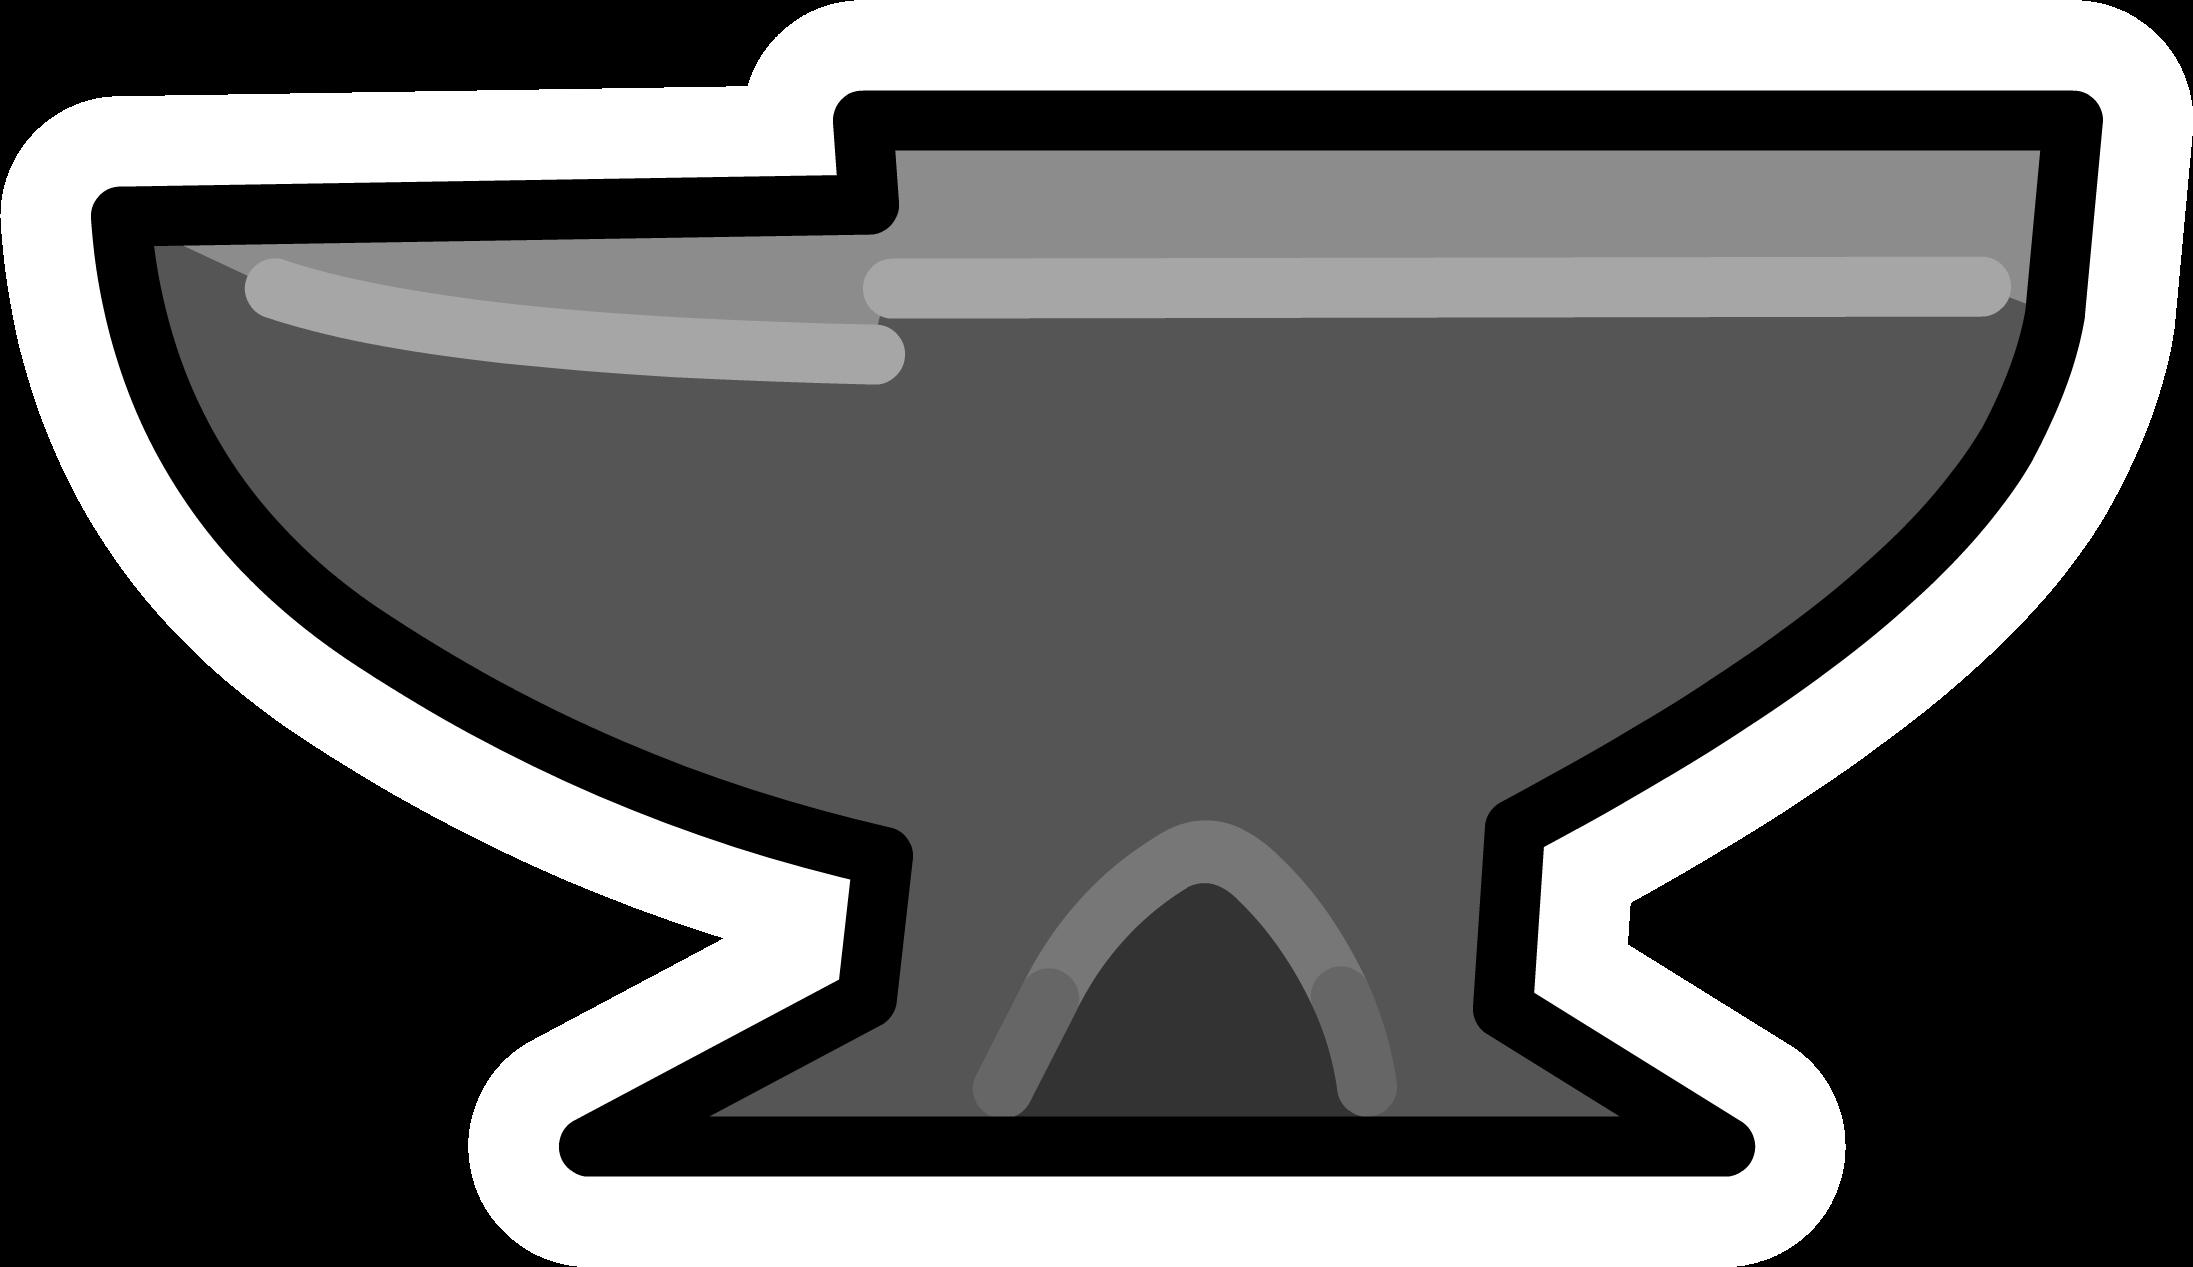 Anvil clipart #13